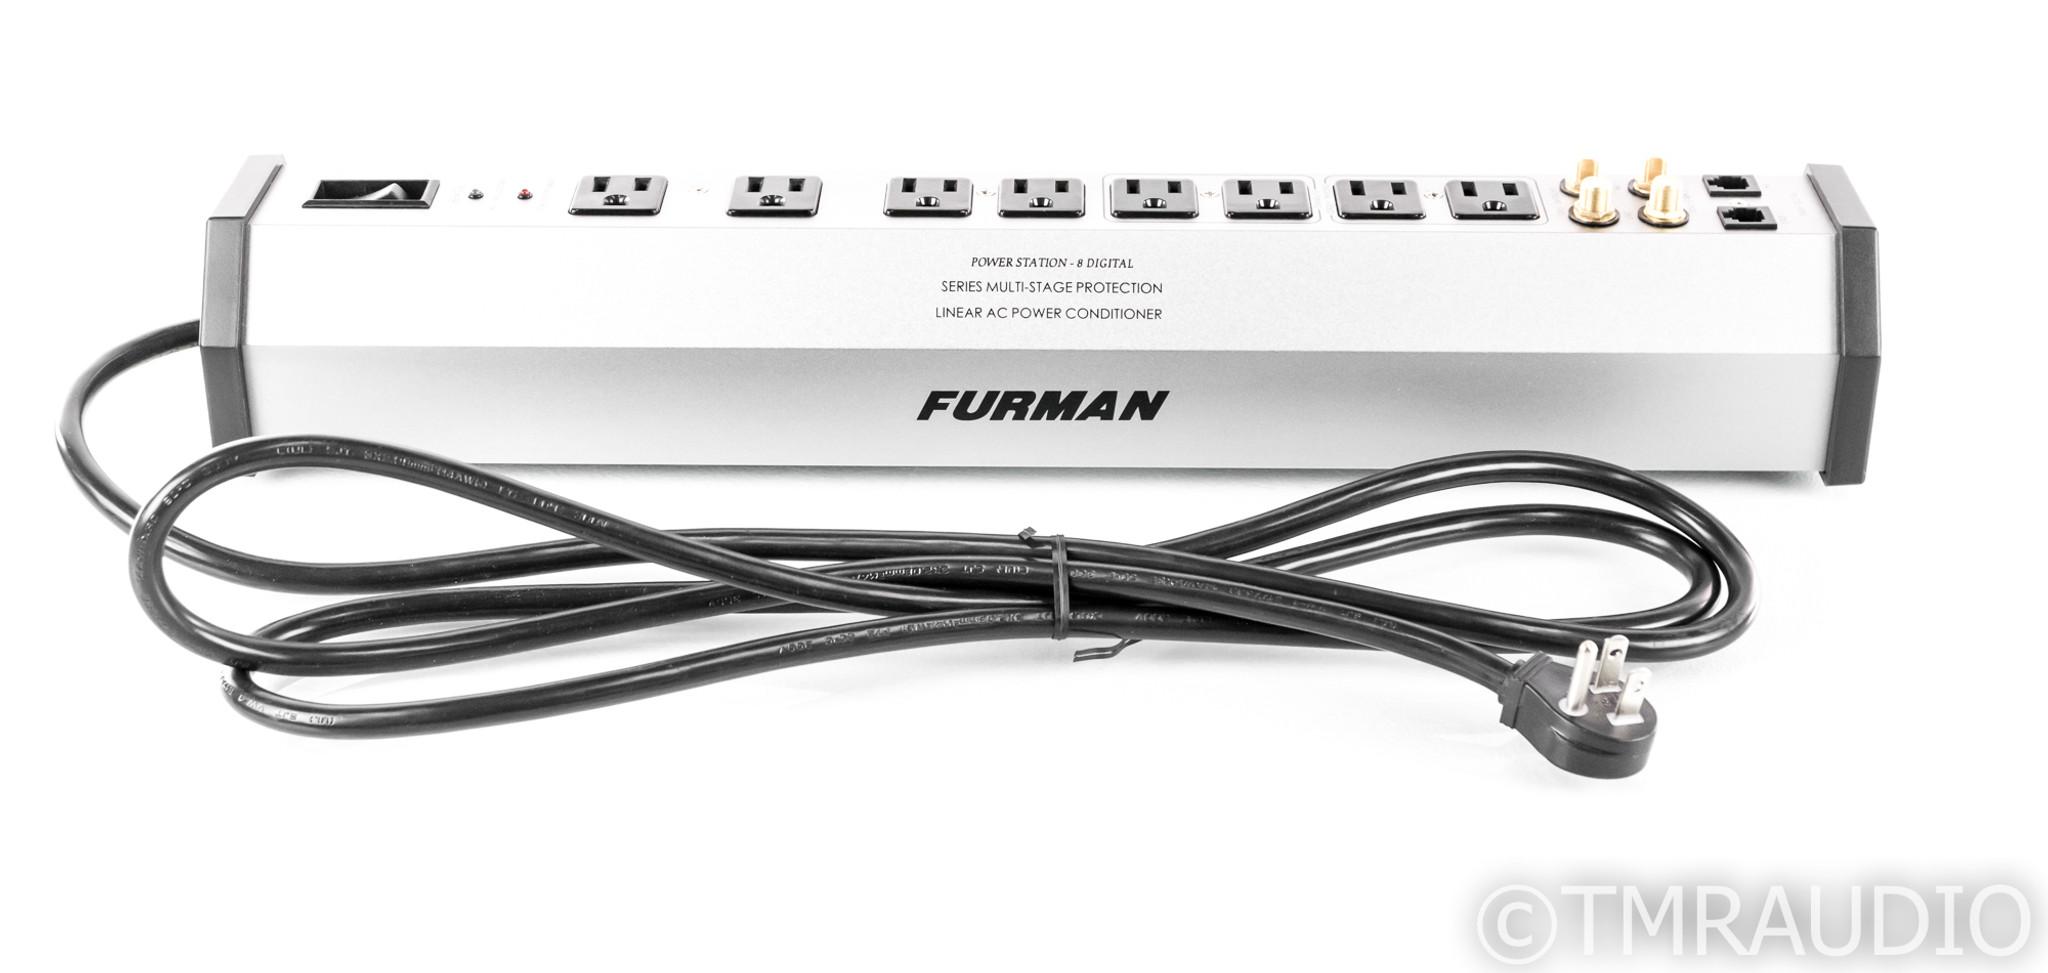 Furman Power Conditioner PST-8D White